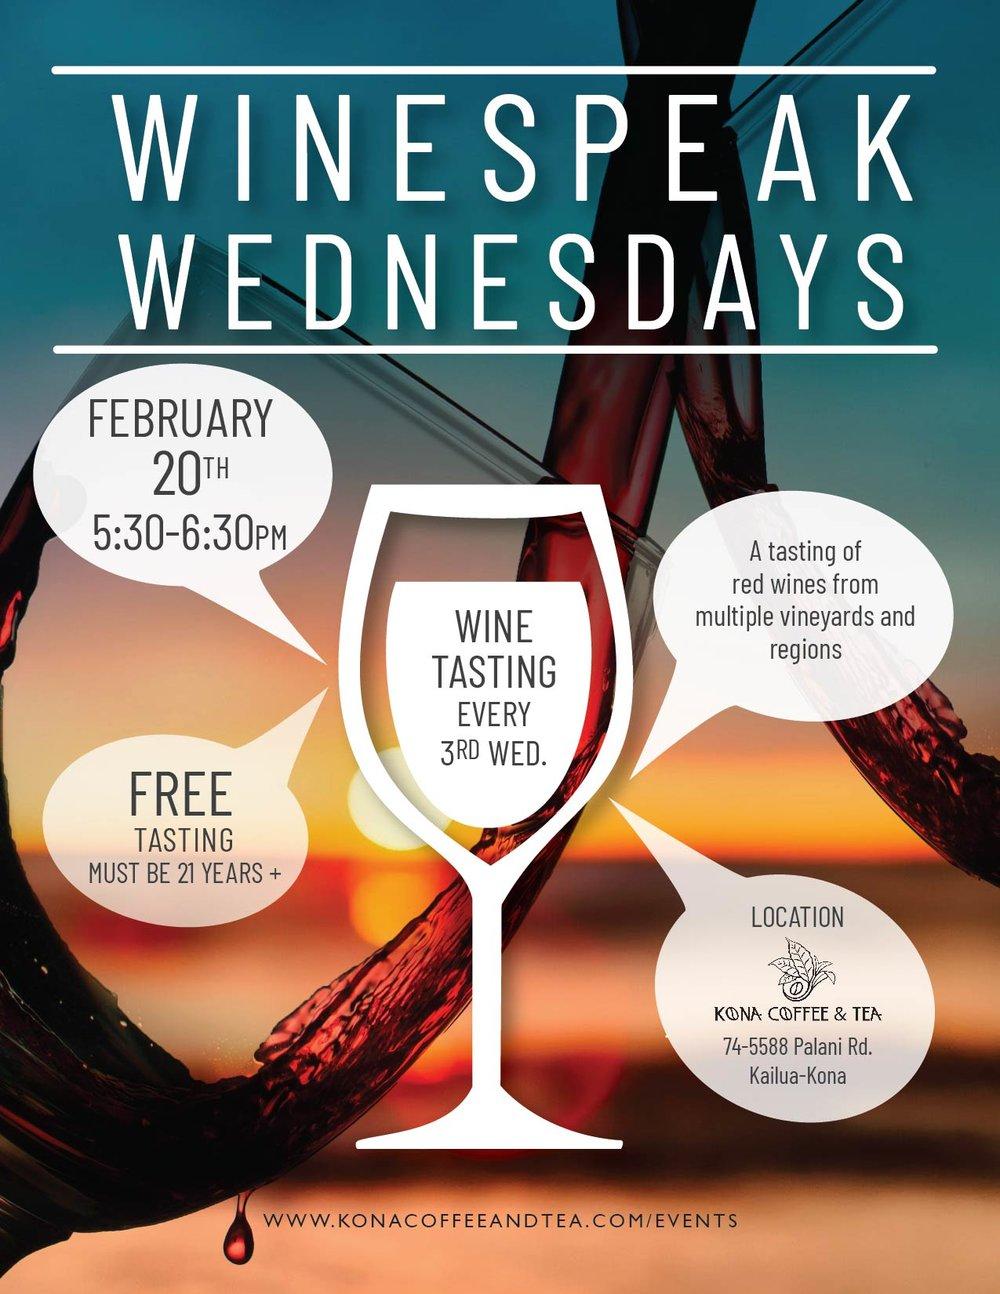 WineSpeak Wednesdays_2.20.19_KCTC_web flyer.jpg